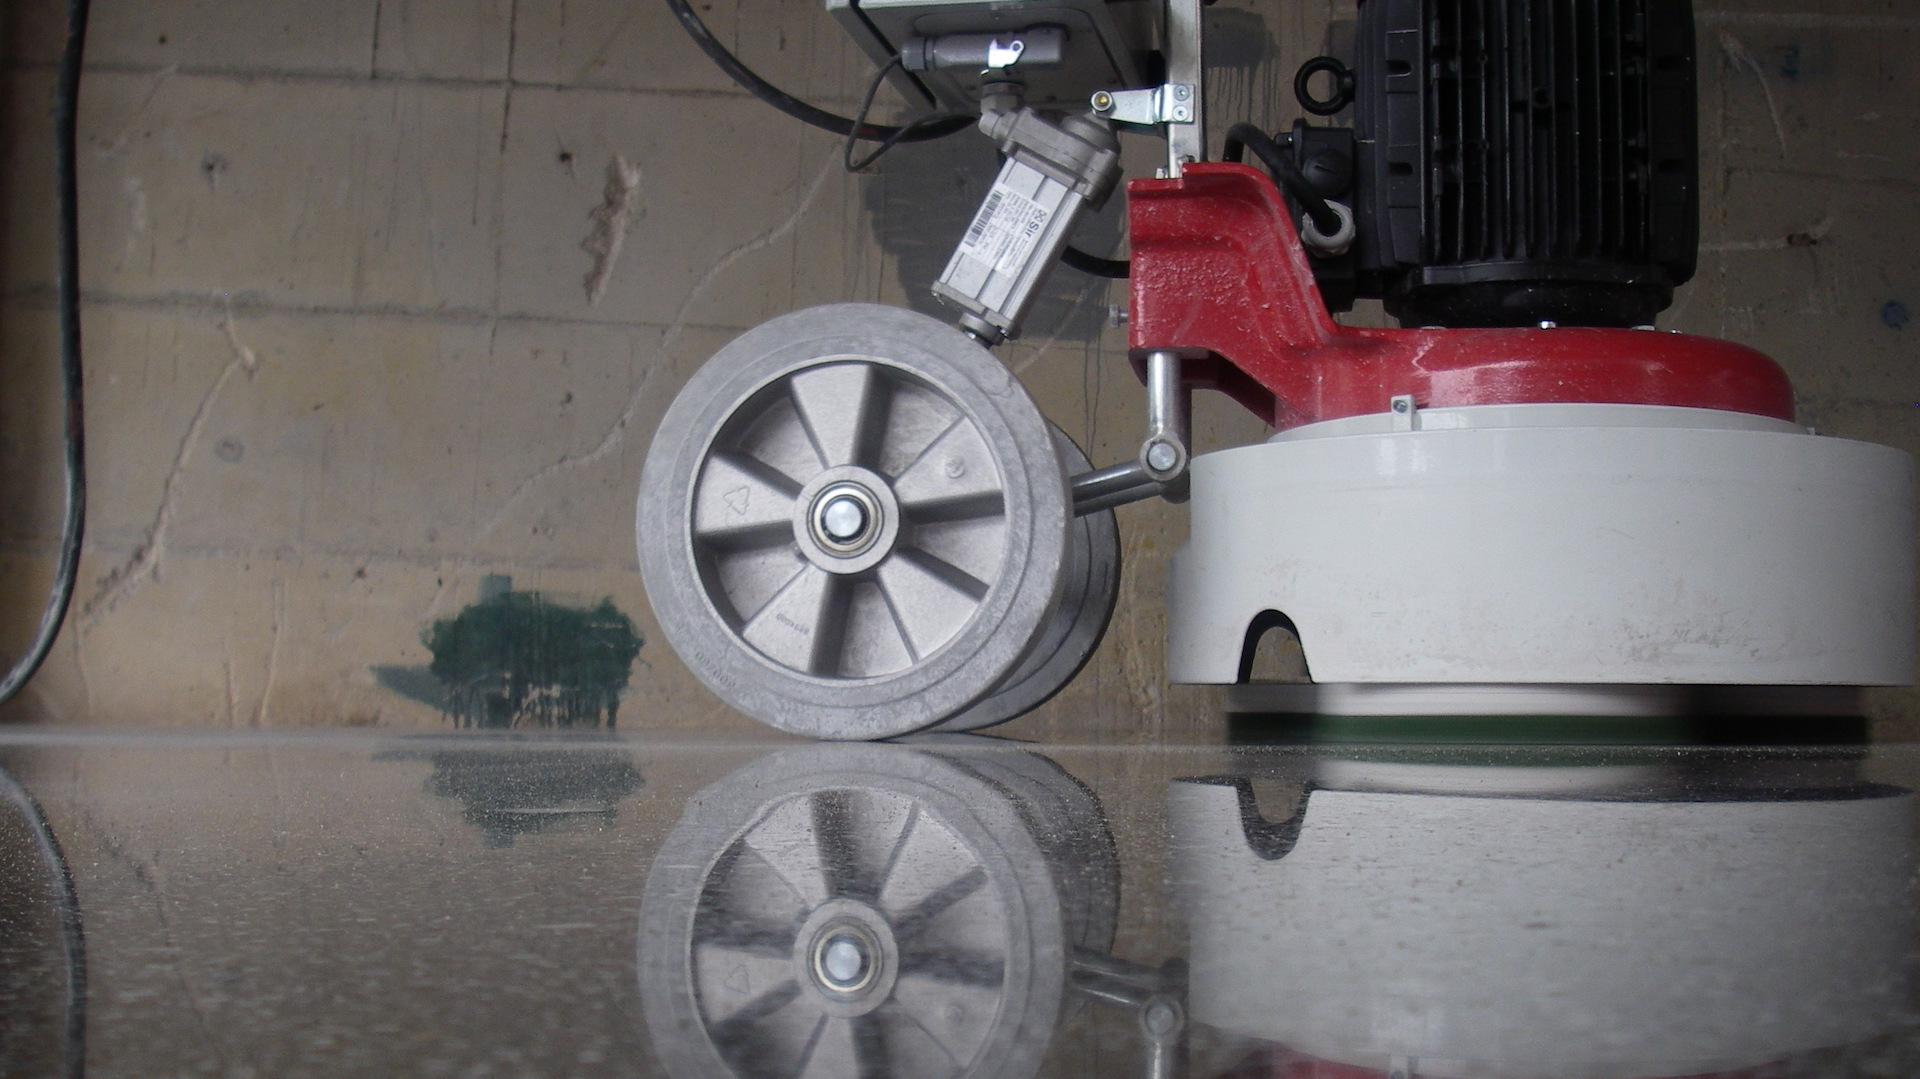 marblecare μηχανές γυαλίσματος μαρμάρου και τσιμέντου